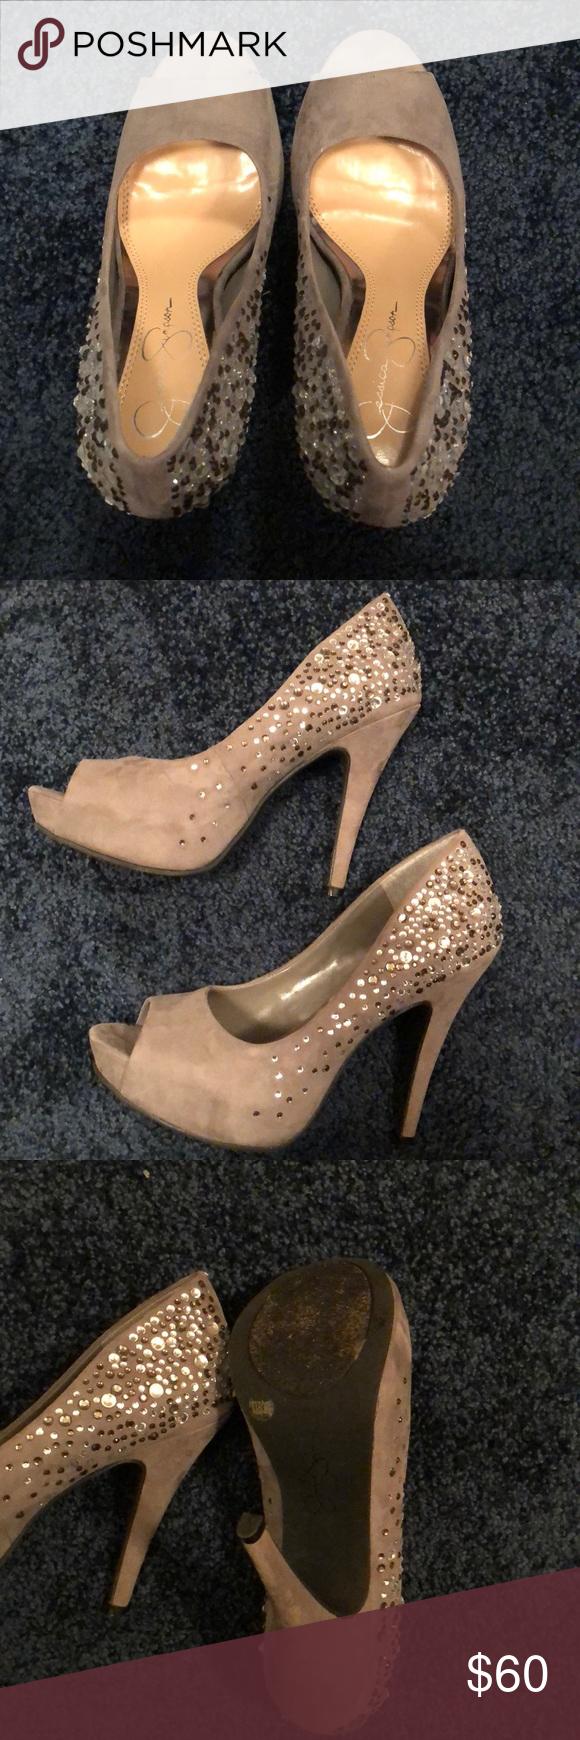 a284a6e2197 Jessica Simpson platform heels Size 6.5 Gray suede with rhinestones Peep  toe platforms Jessica Simpson Shoes Heels